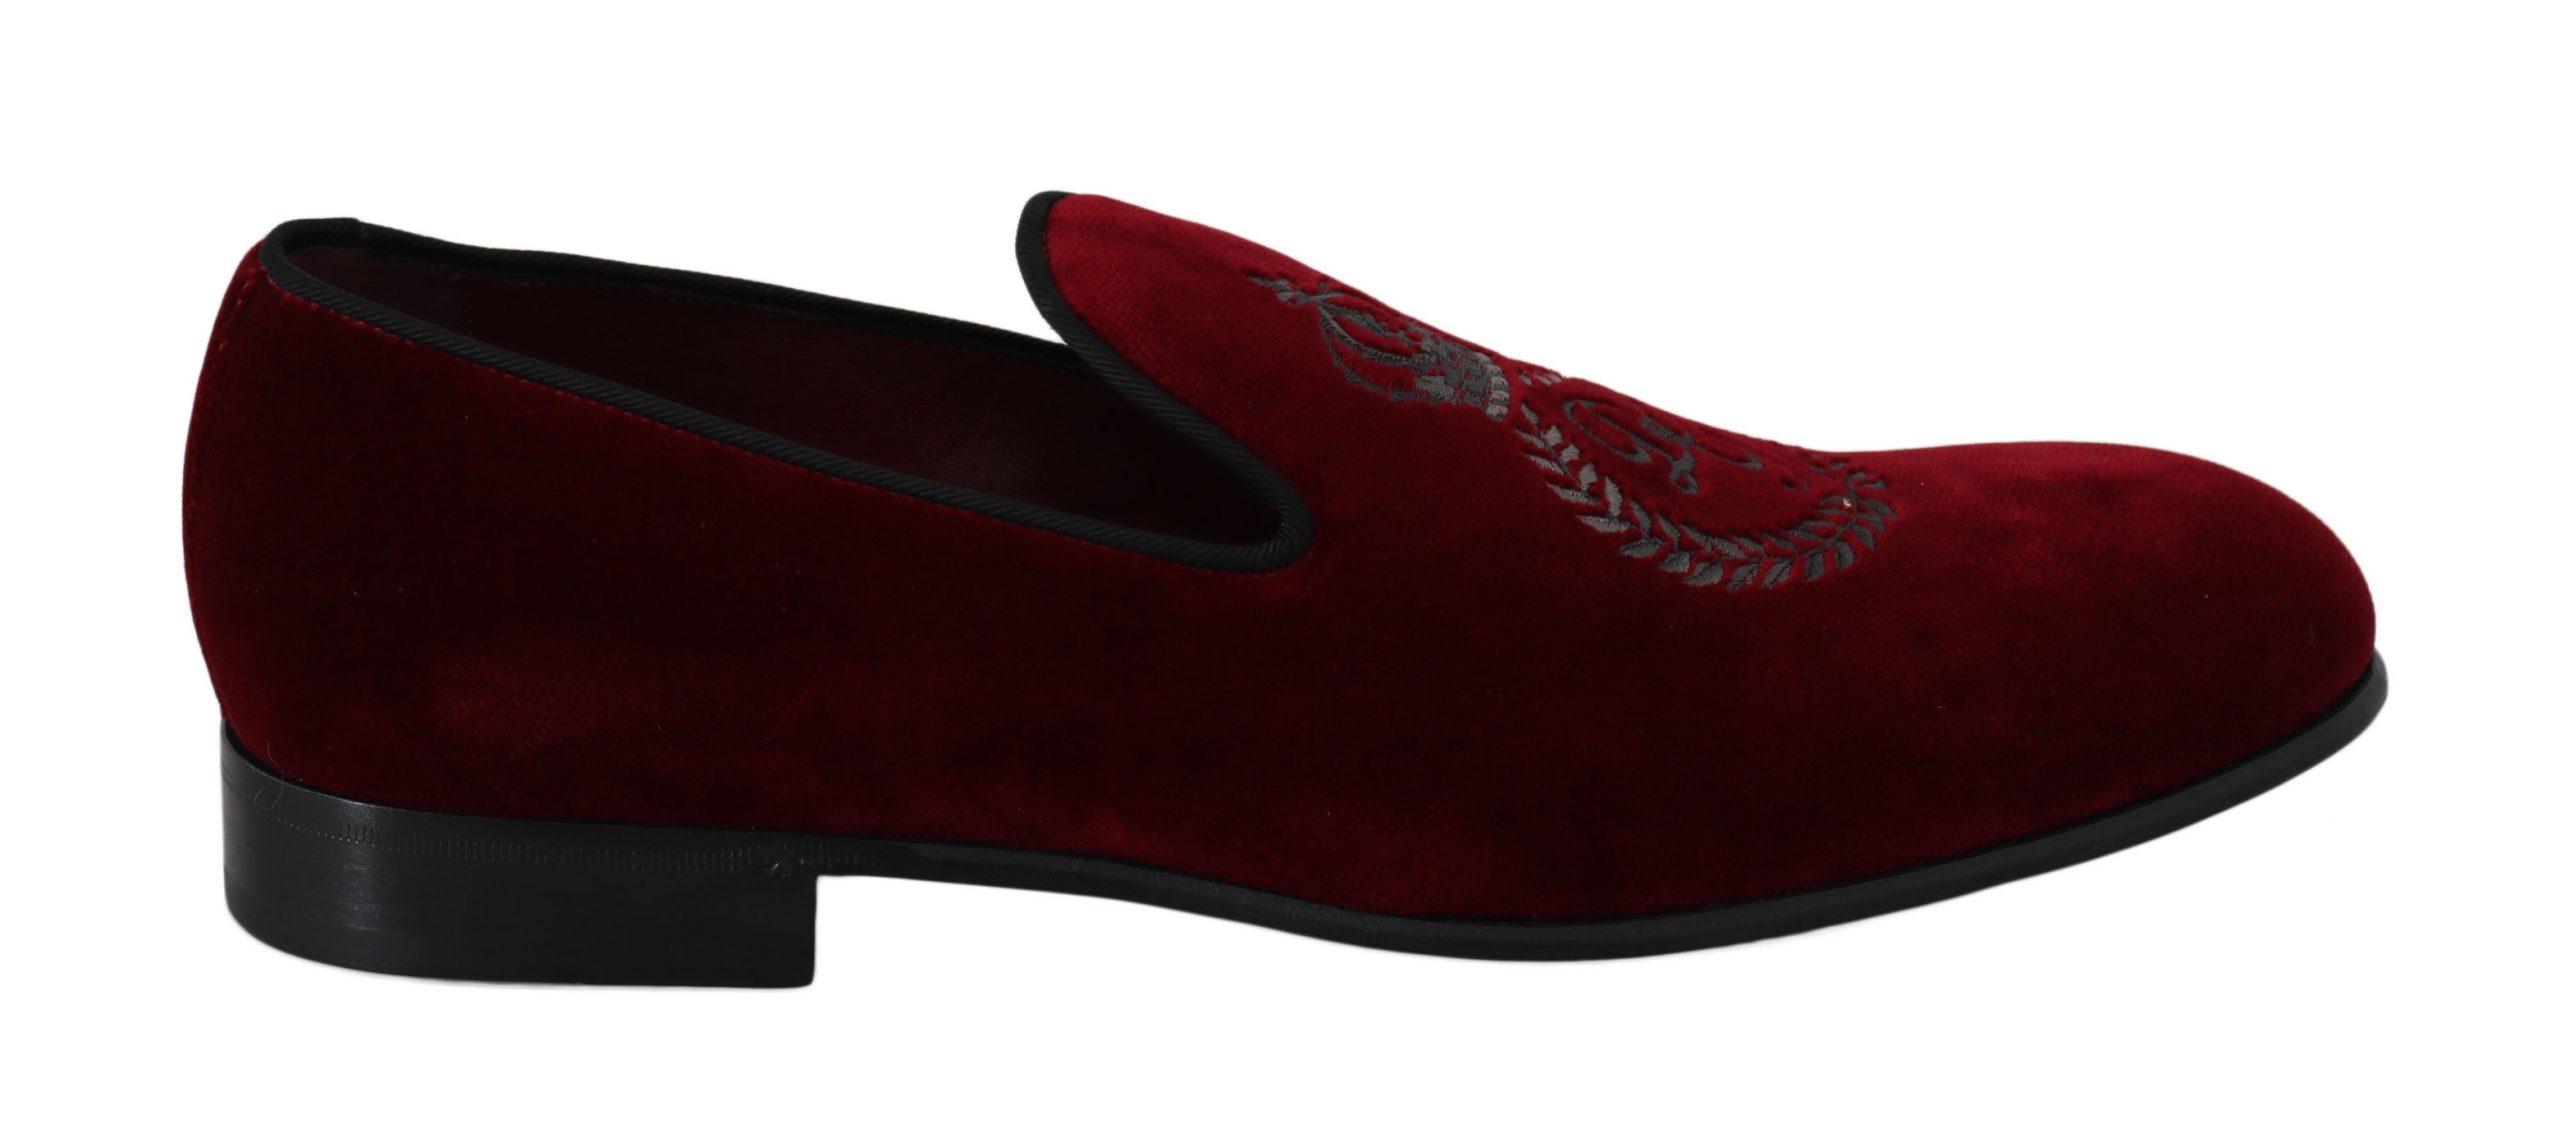 Dolce & Gabbana Men's Velvet Crown Embroidered Loafers Red MV2342 - EU41.5/US8.5